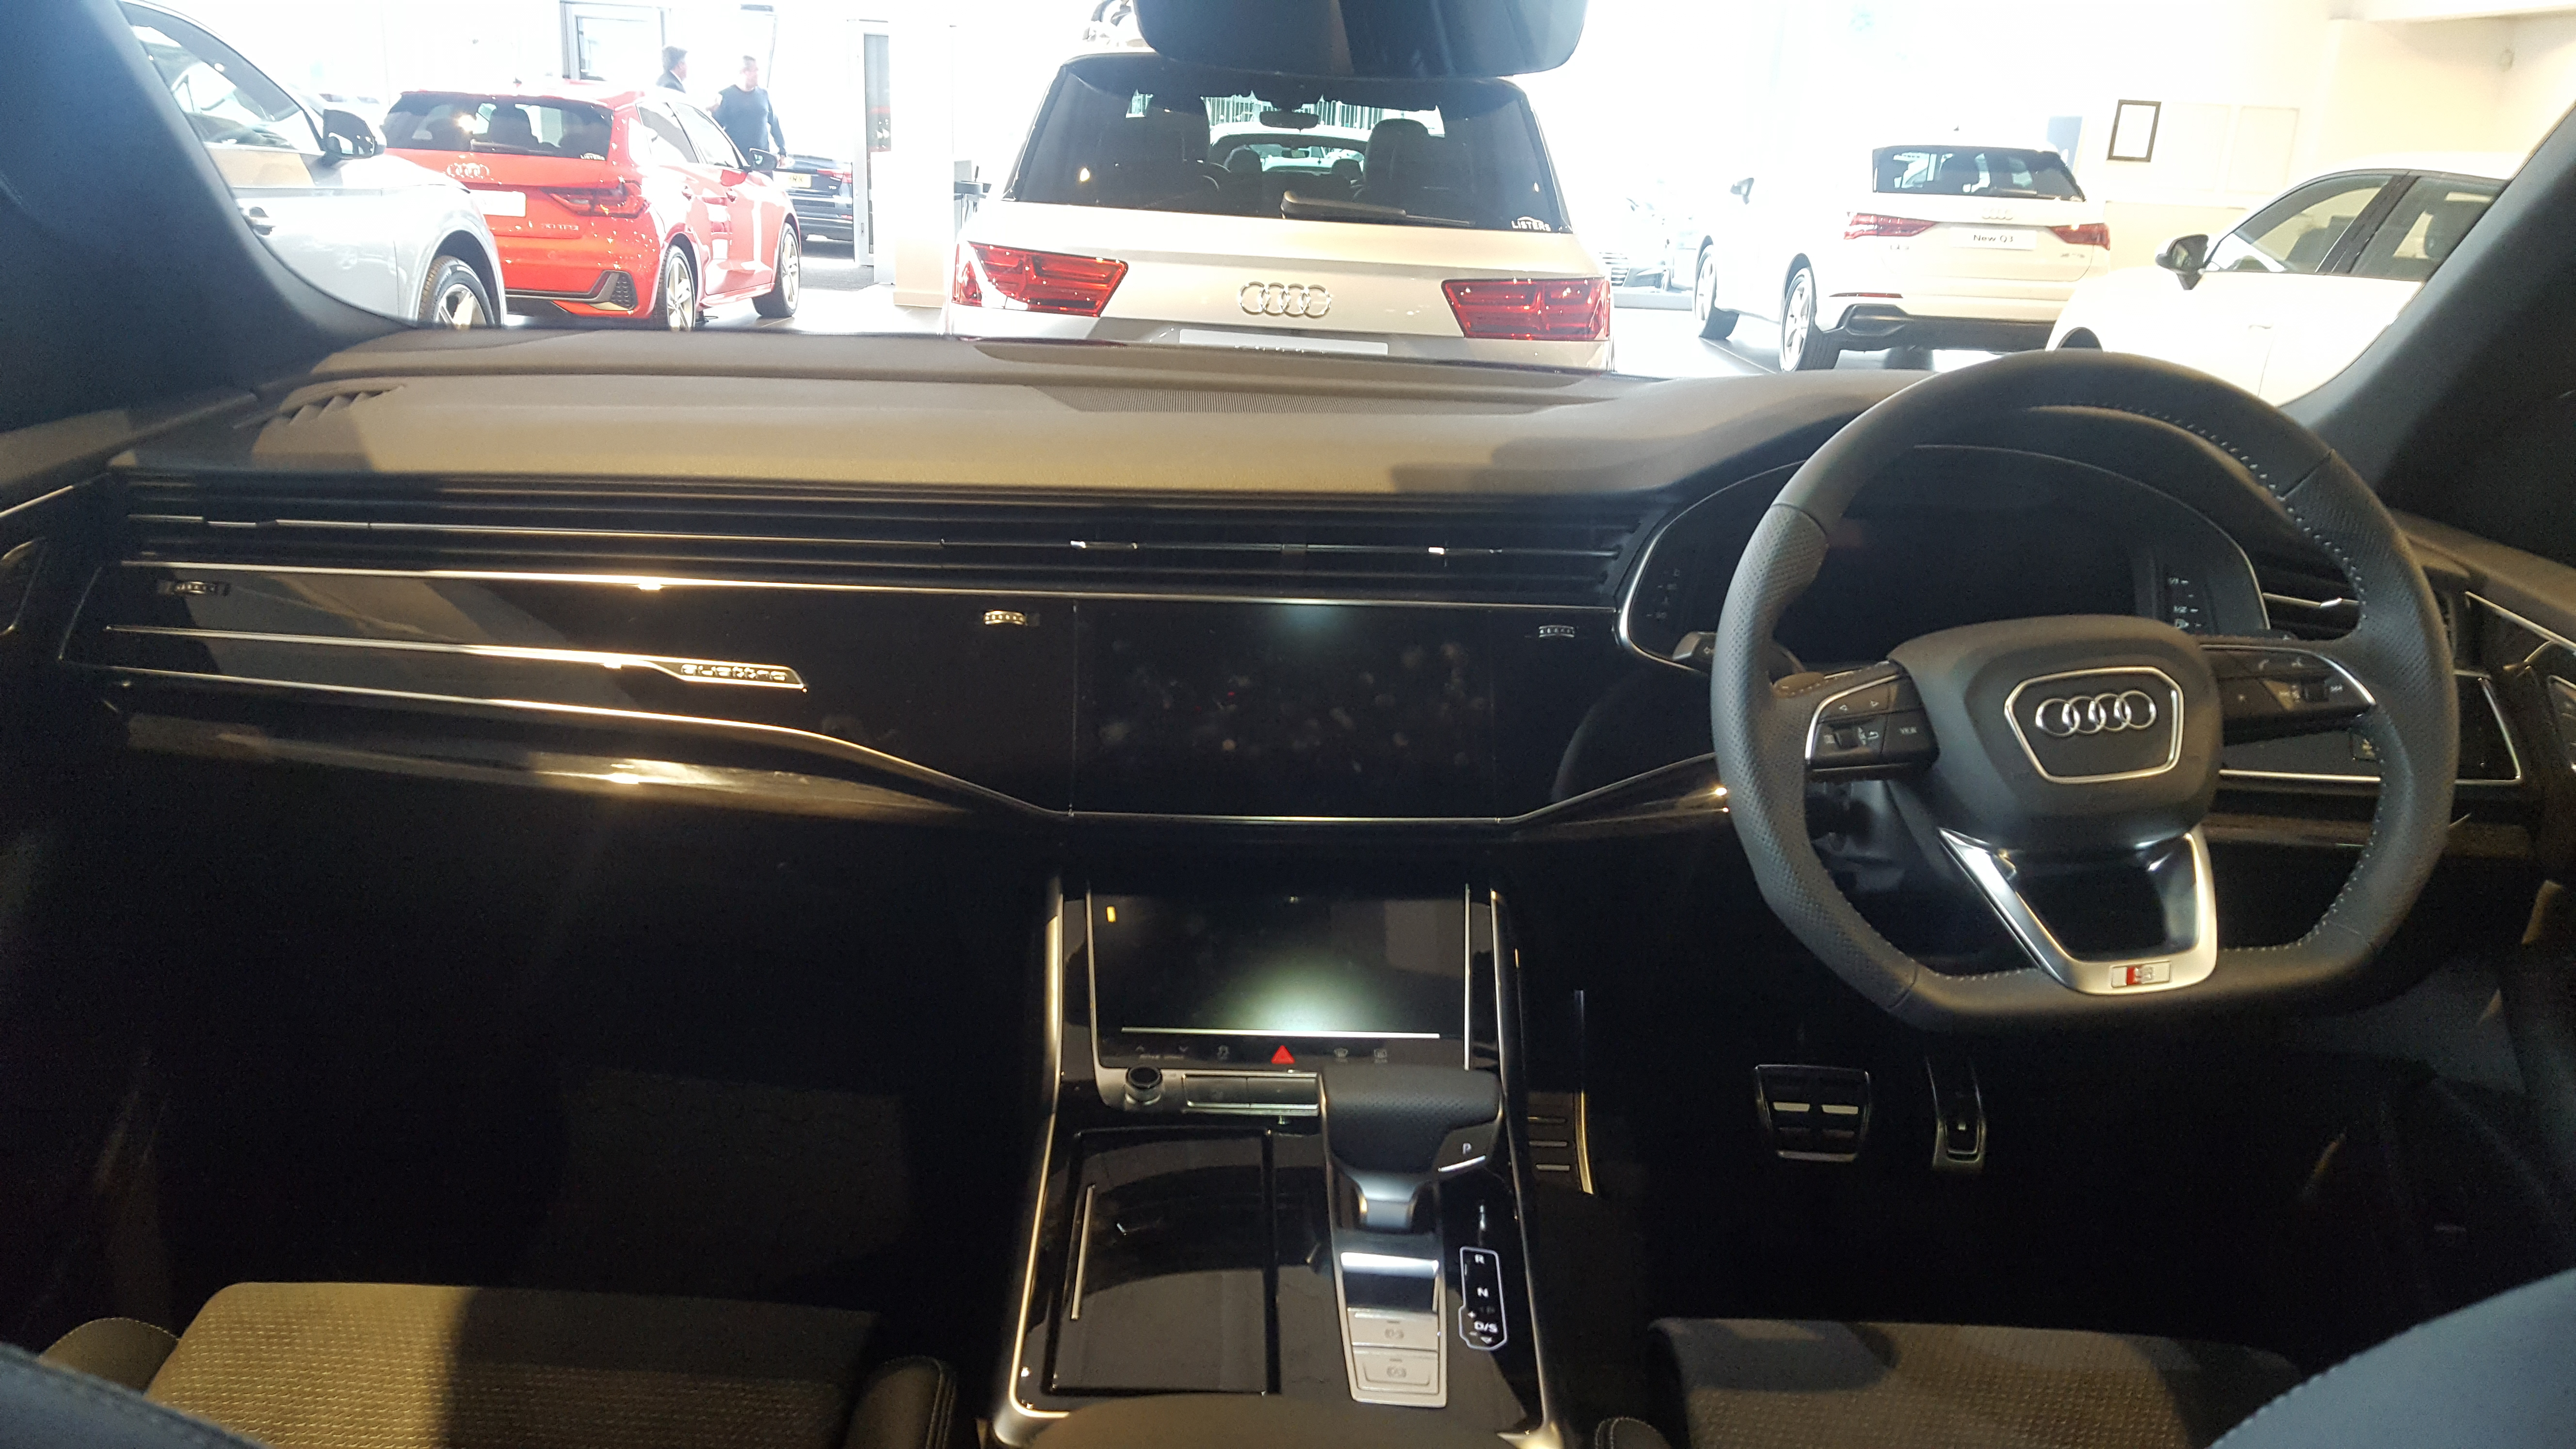 File 2019 Audi Q8 Tdi Quattro 50 Interior Jpg Wikimedia Commons